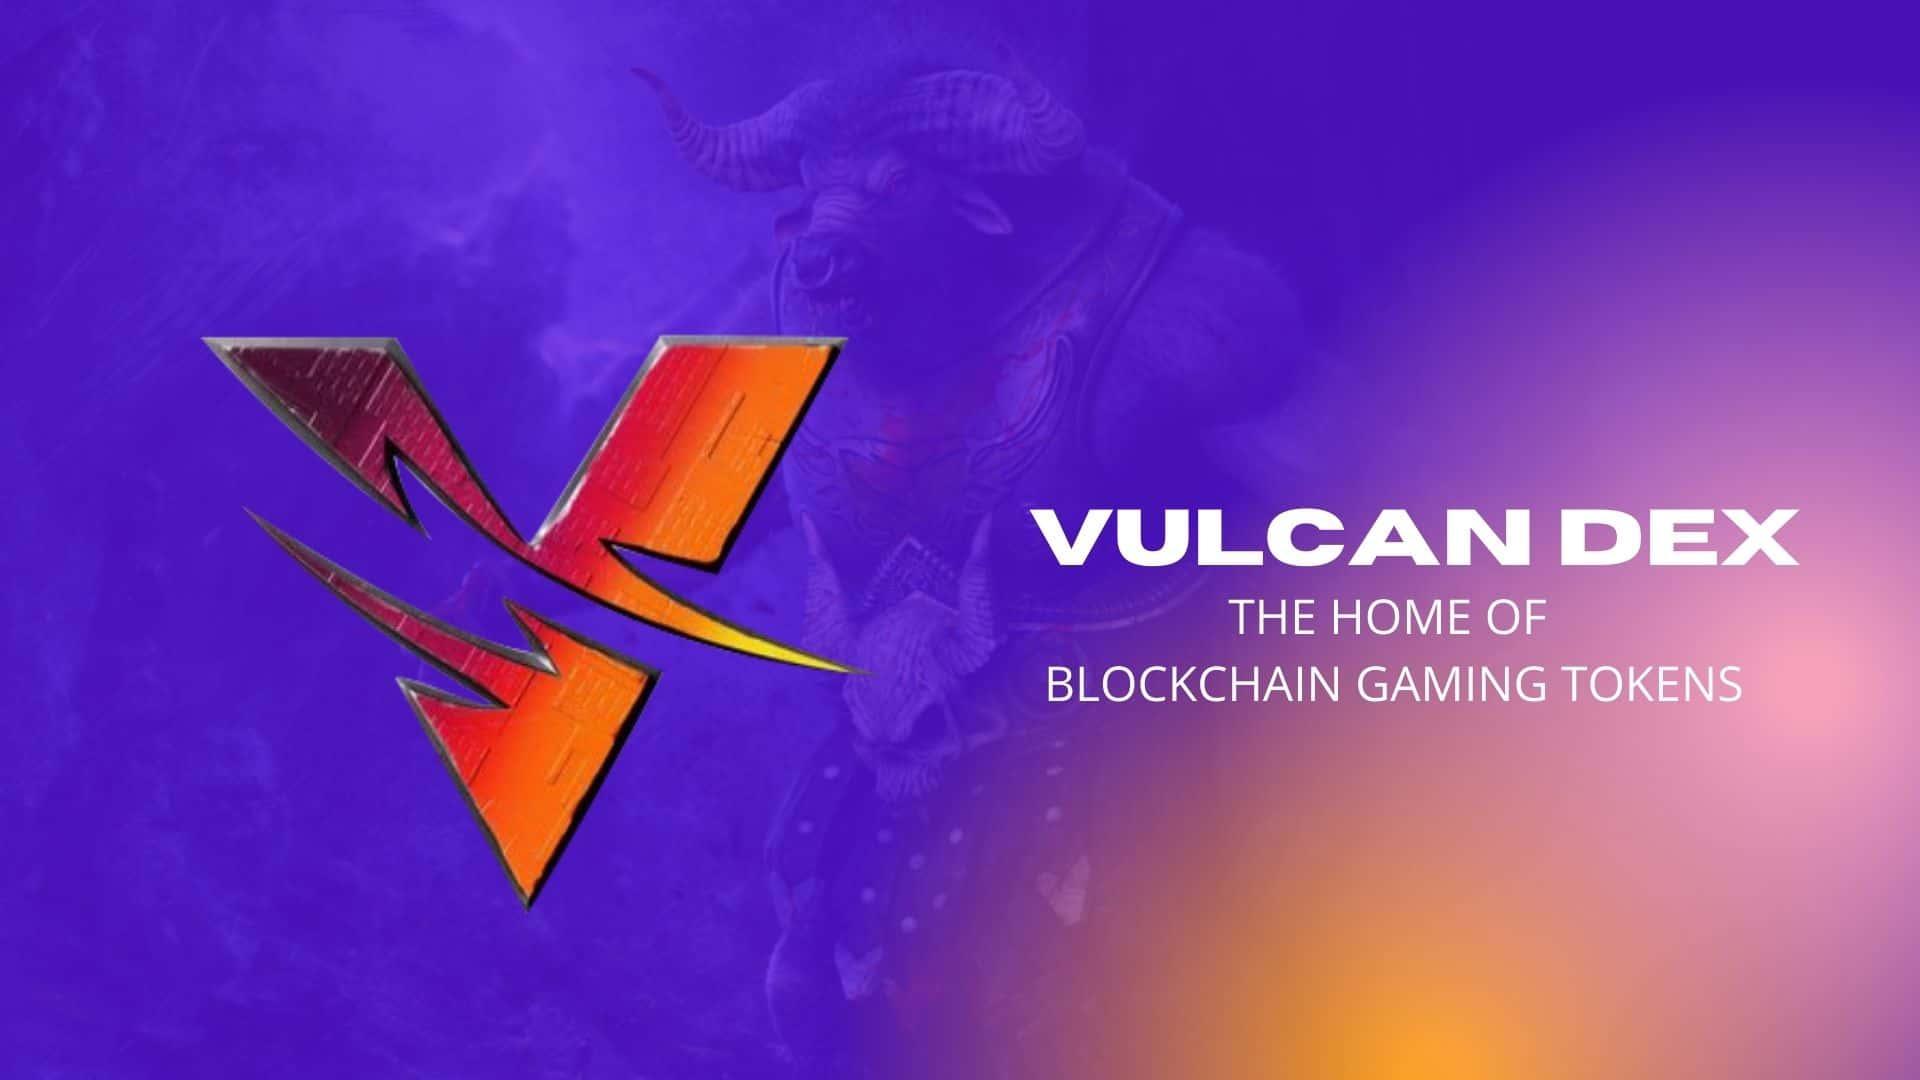 VulcanDEX Swap Blockchain Gaming Tokens